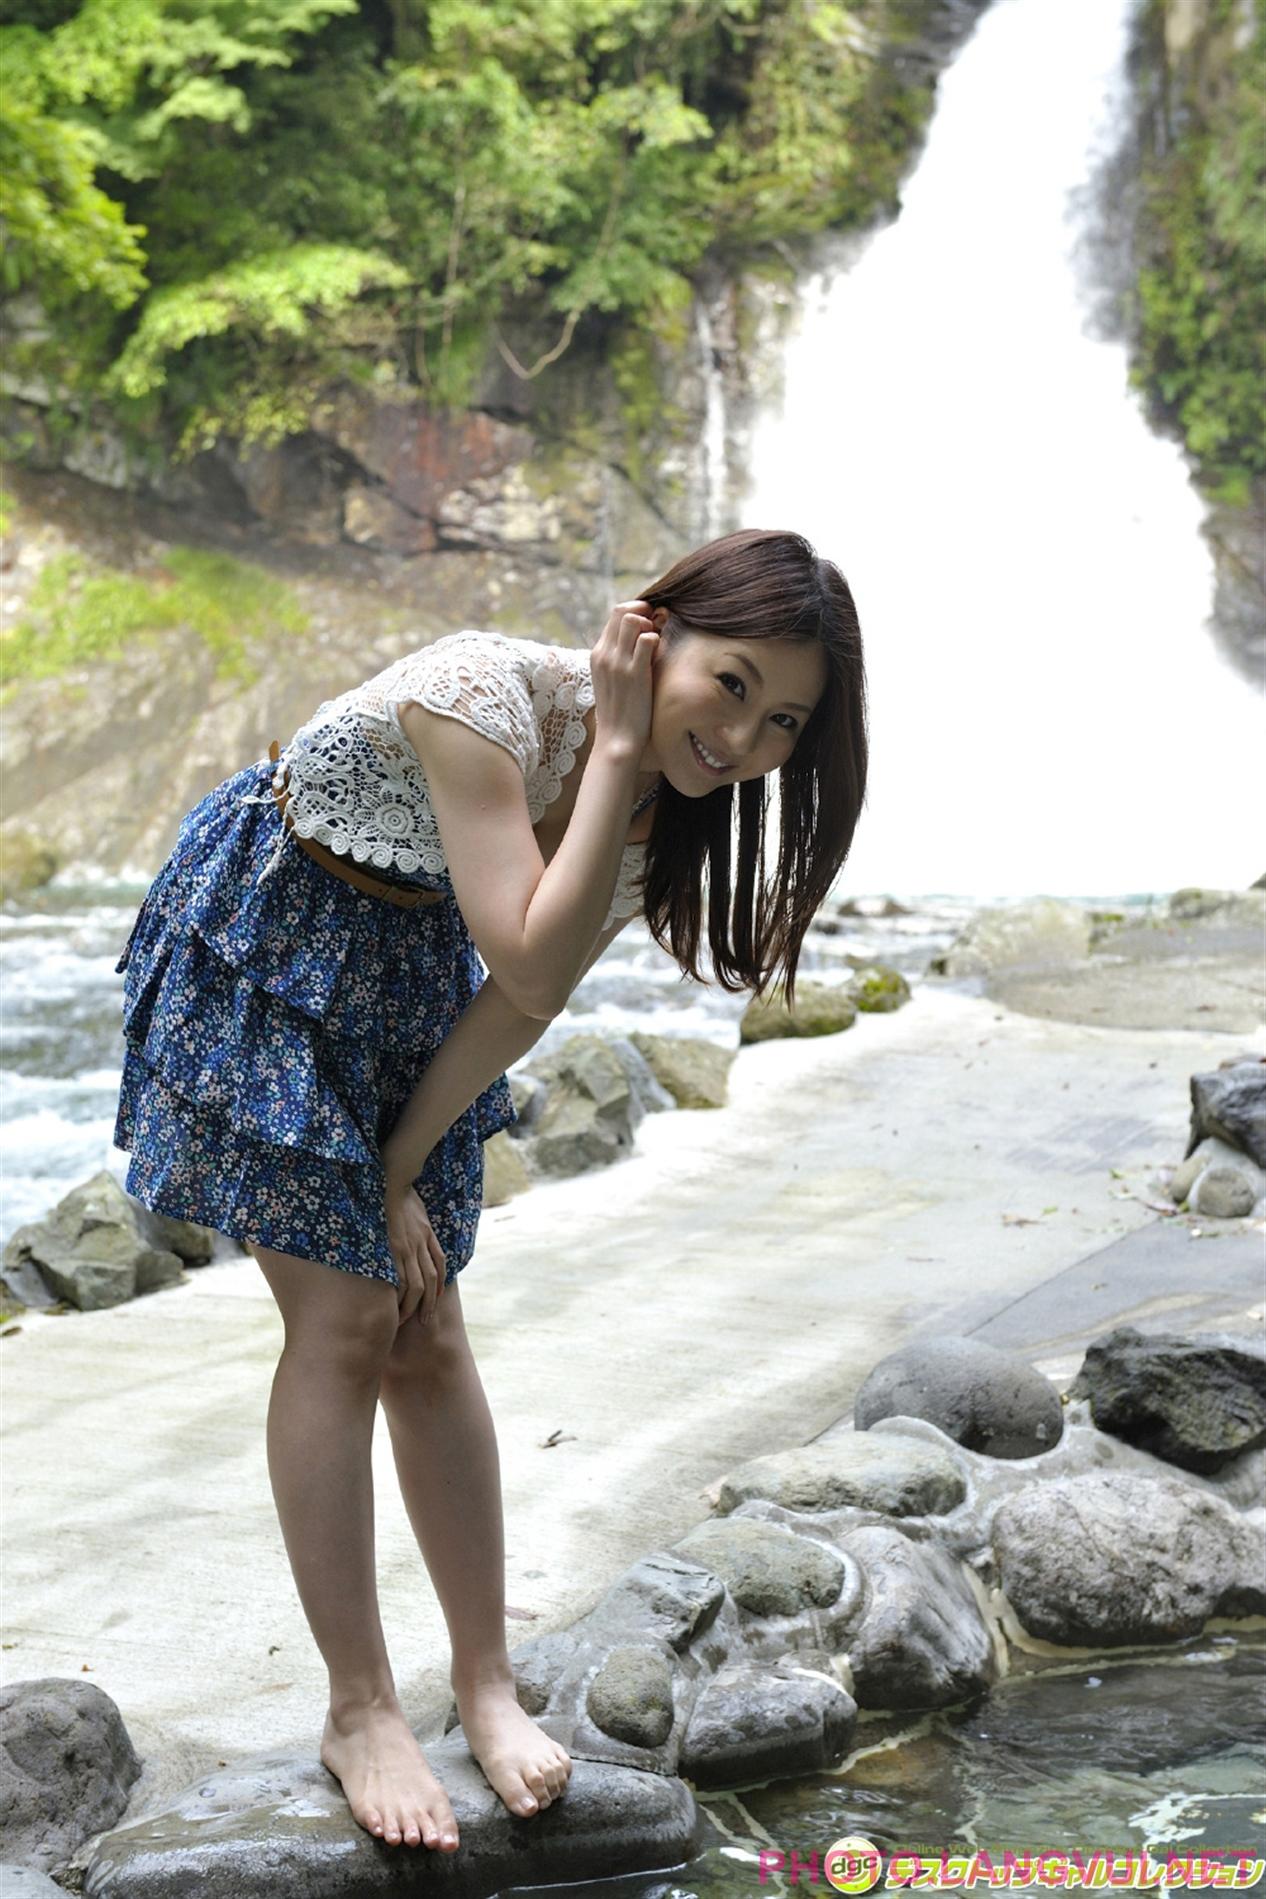 DGC No 1213 Yui Tatsumi - Page 6 of 11 - Ảnh Girl Xinh